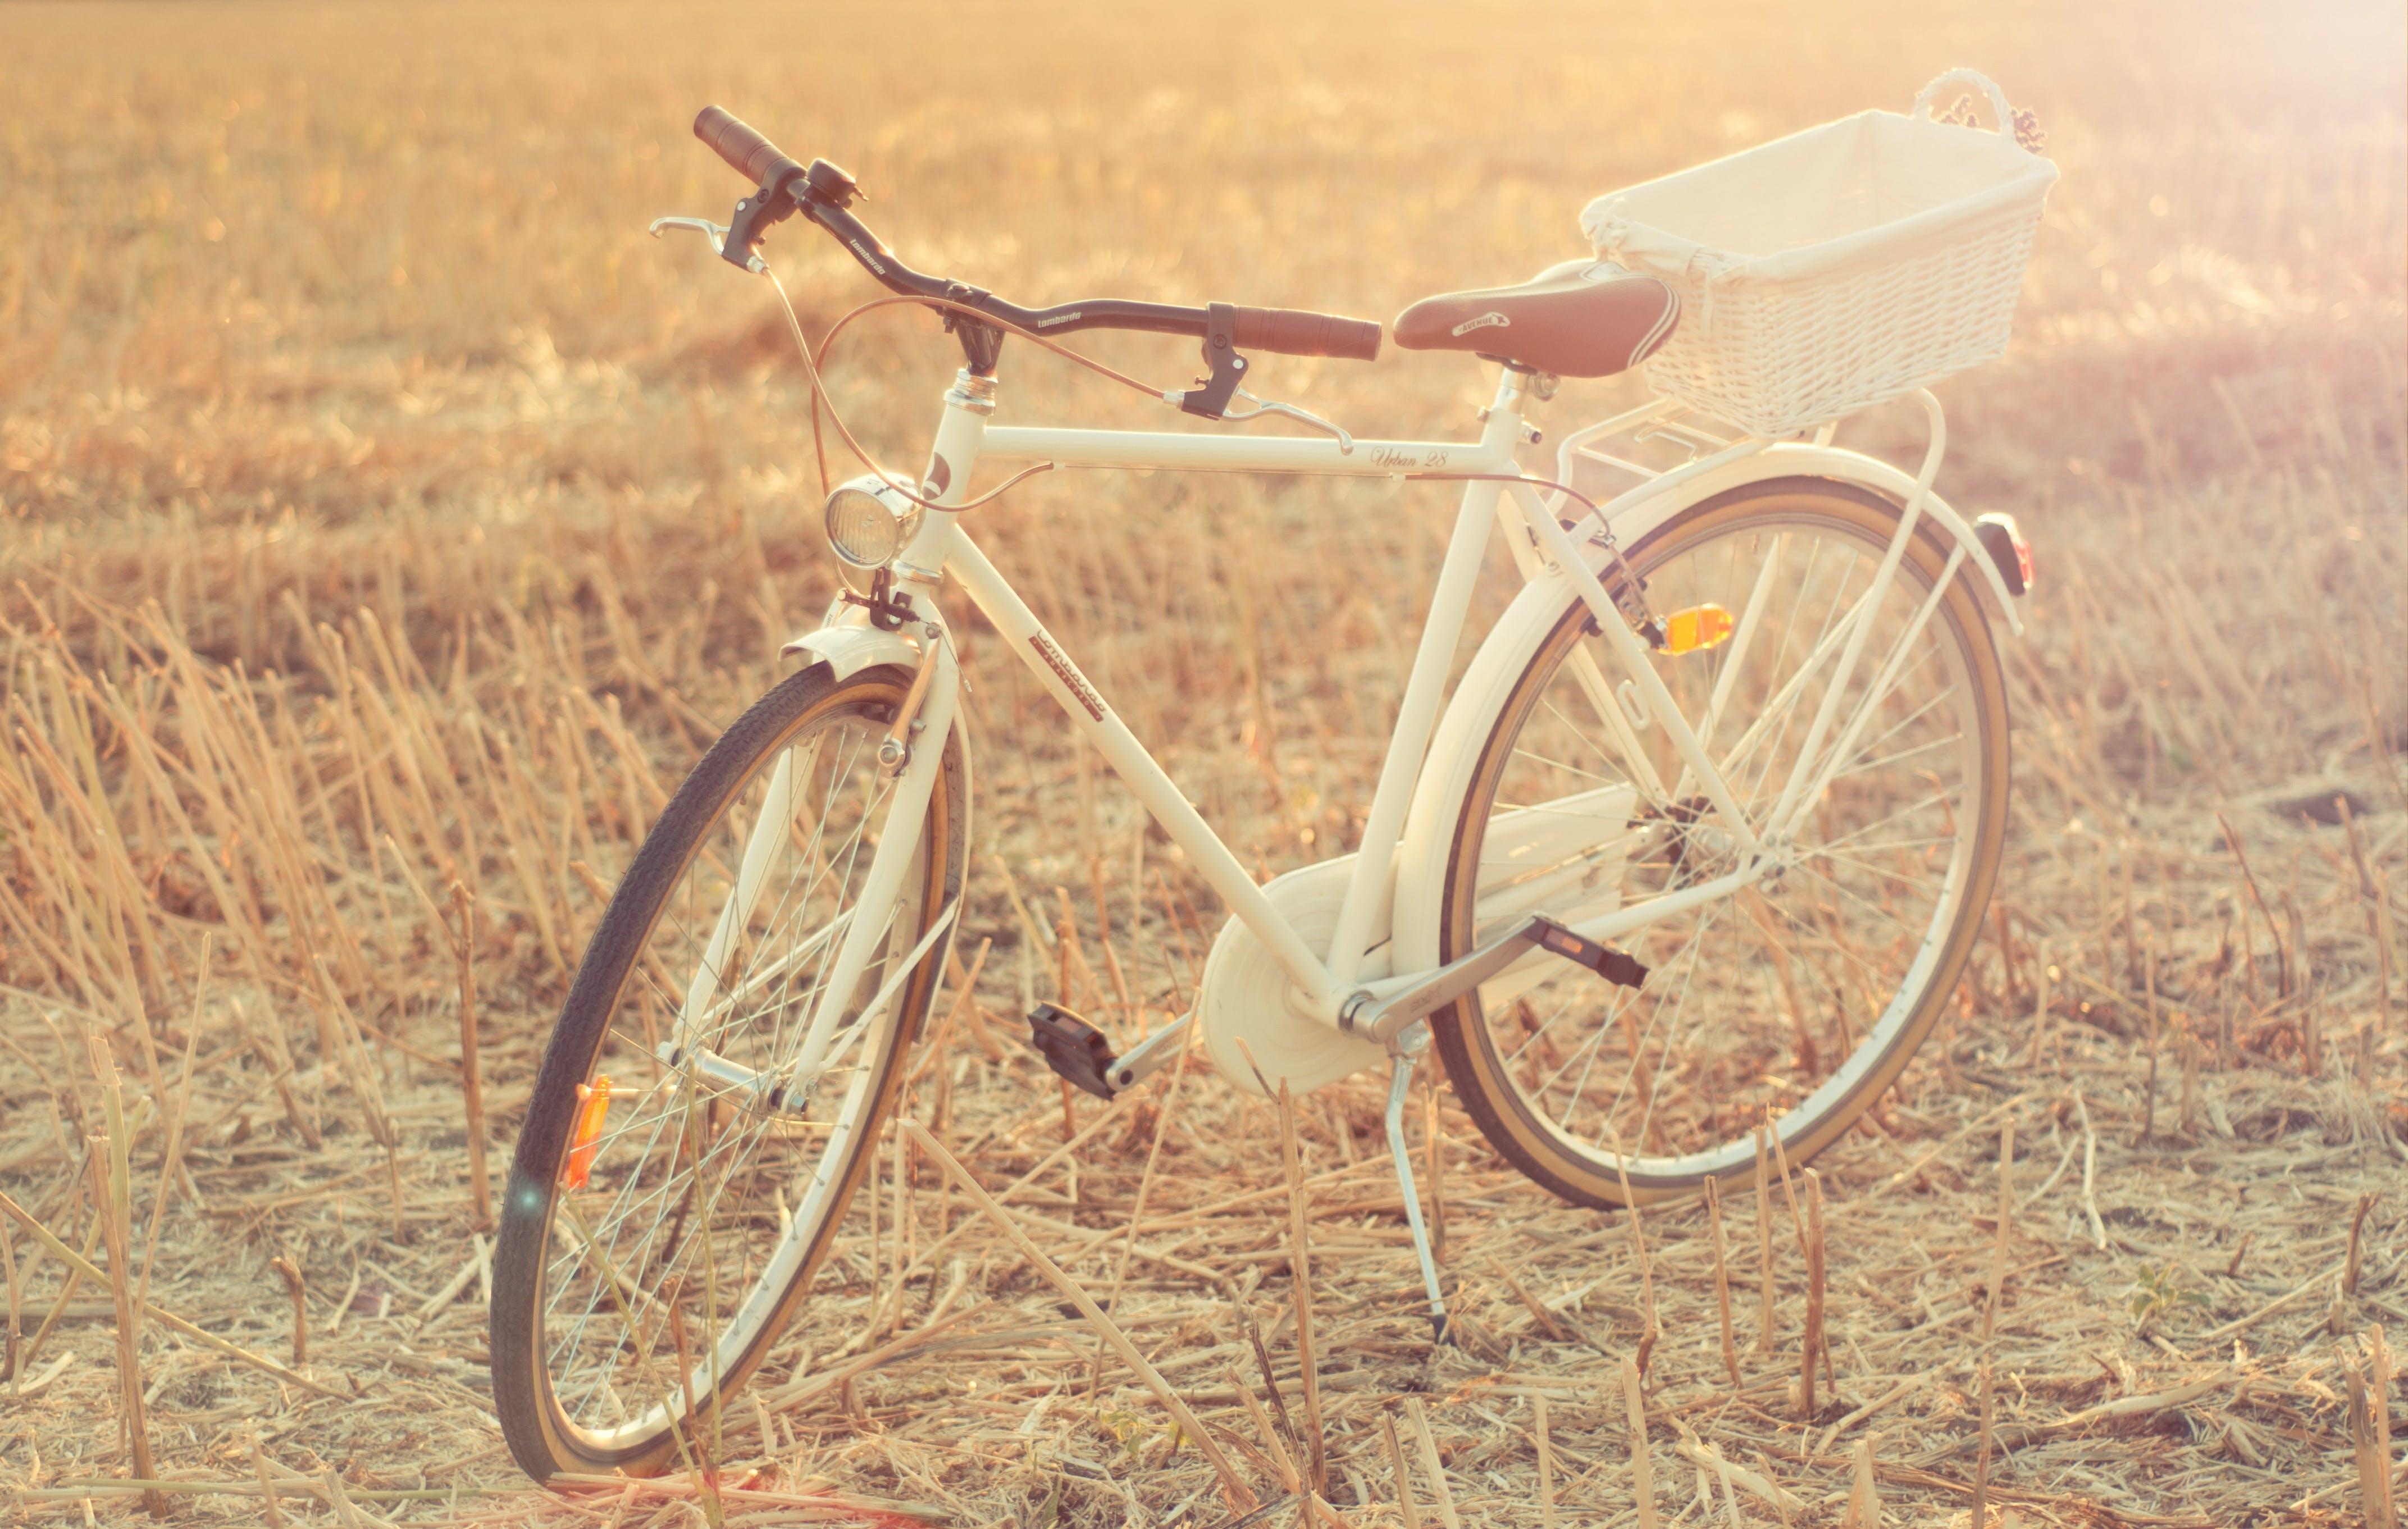 White City Bike on Wheat Field